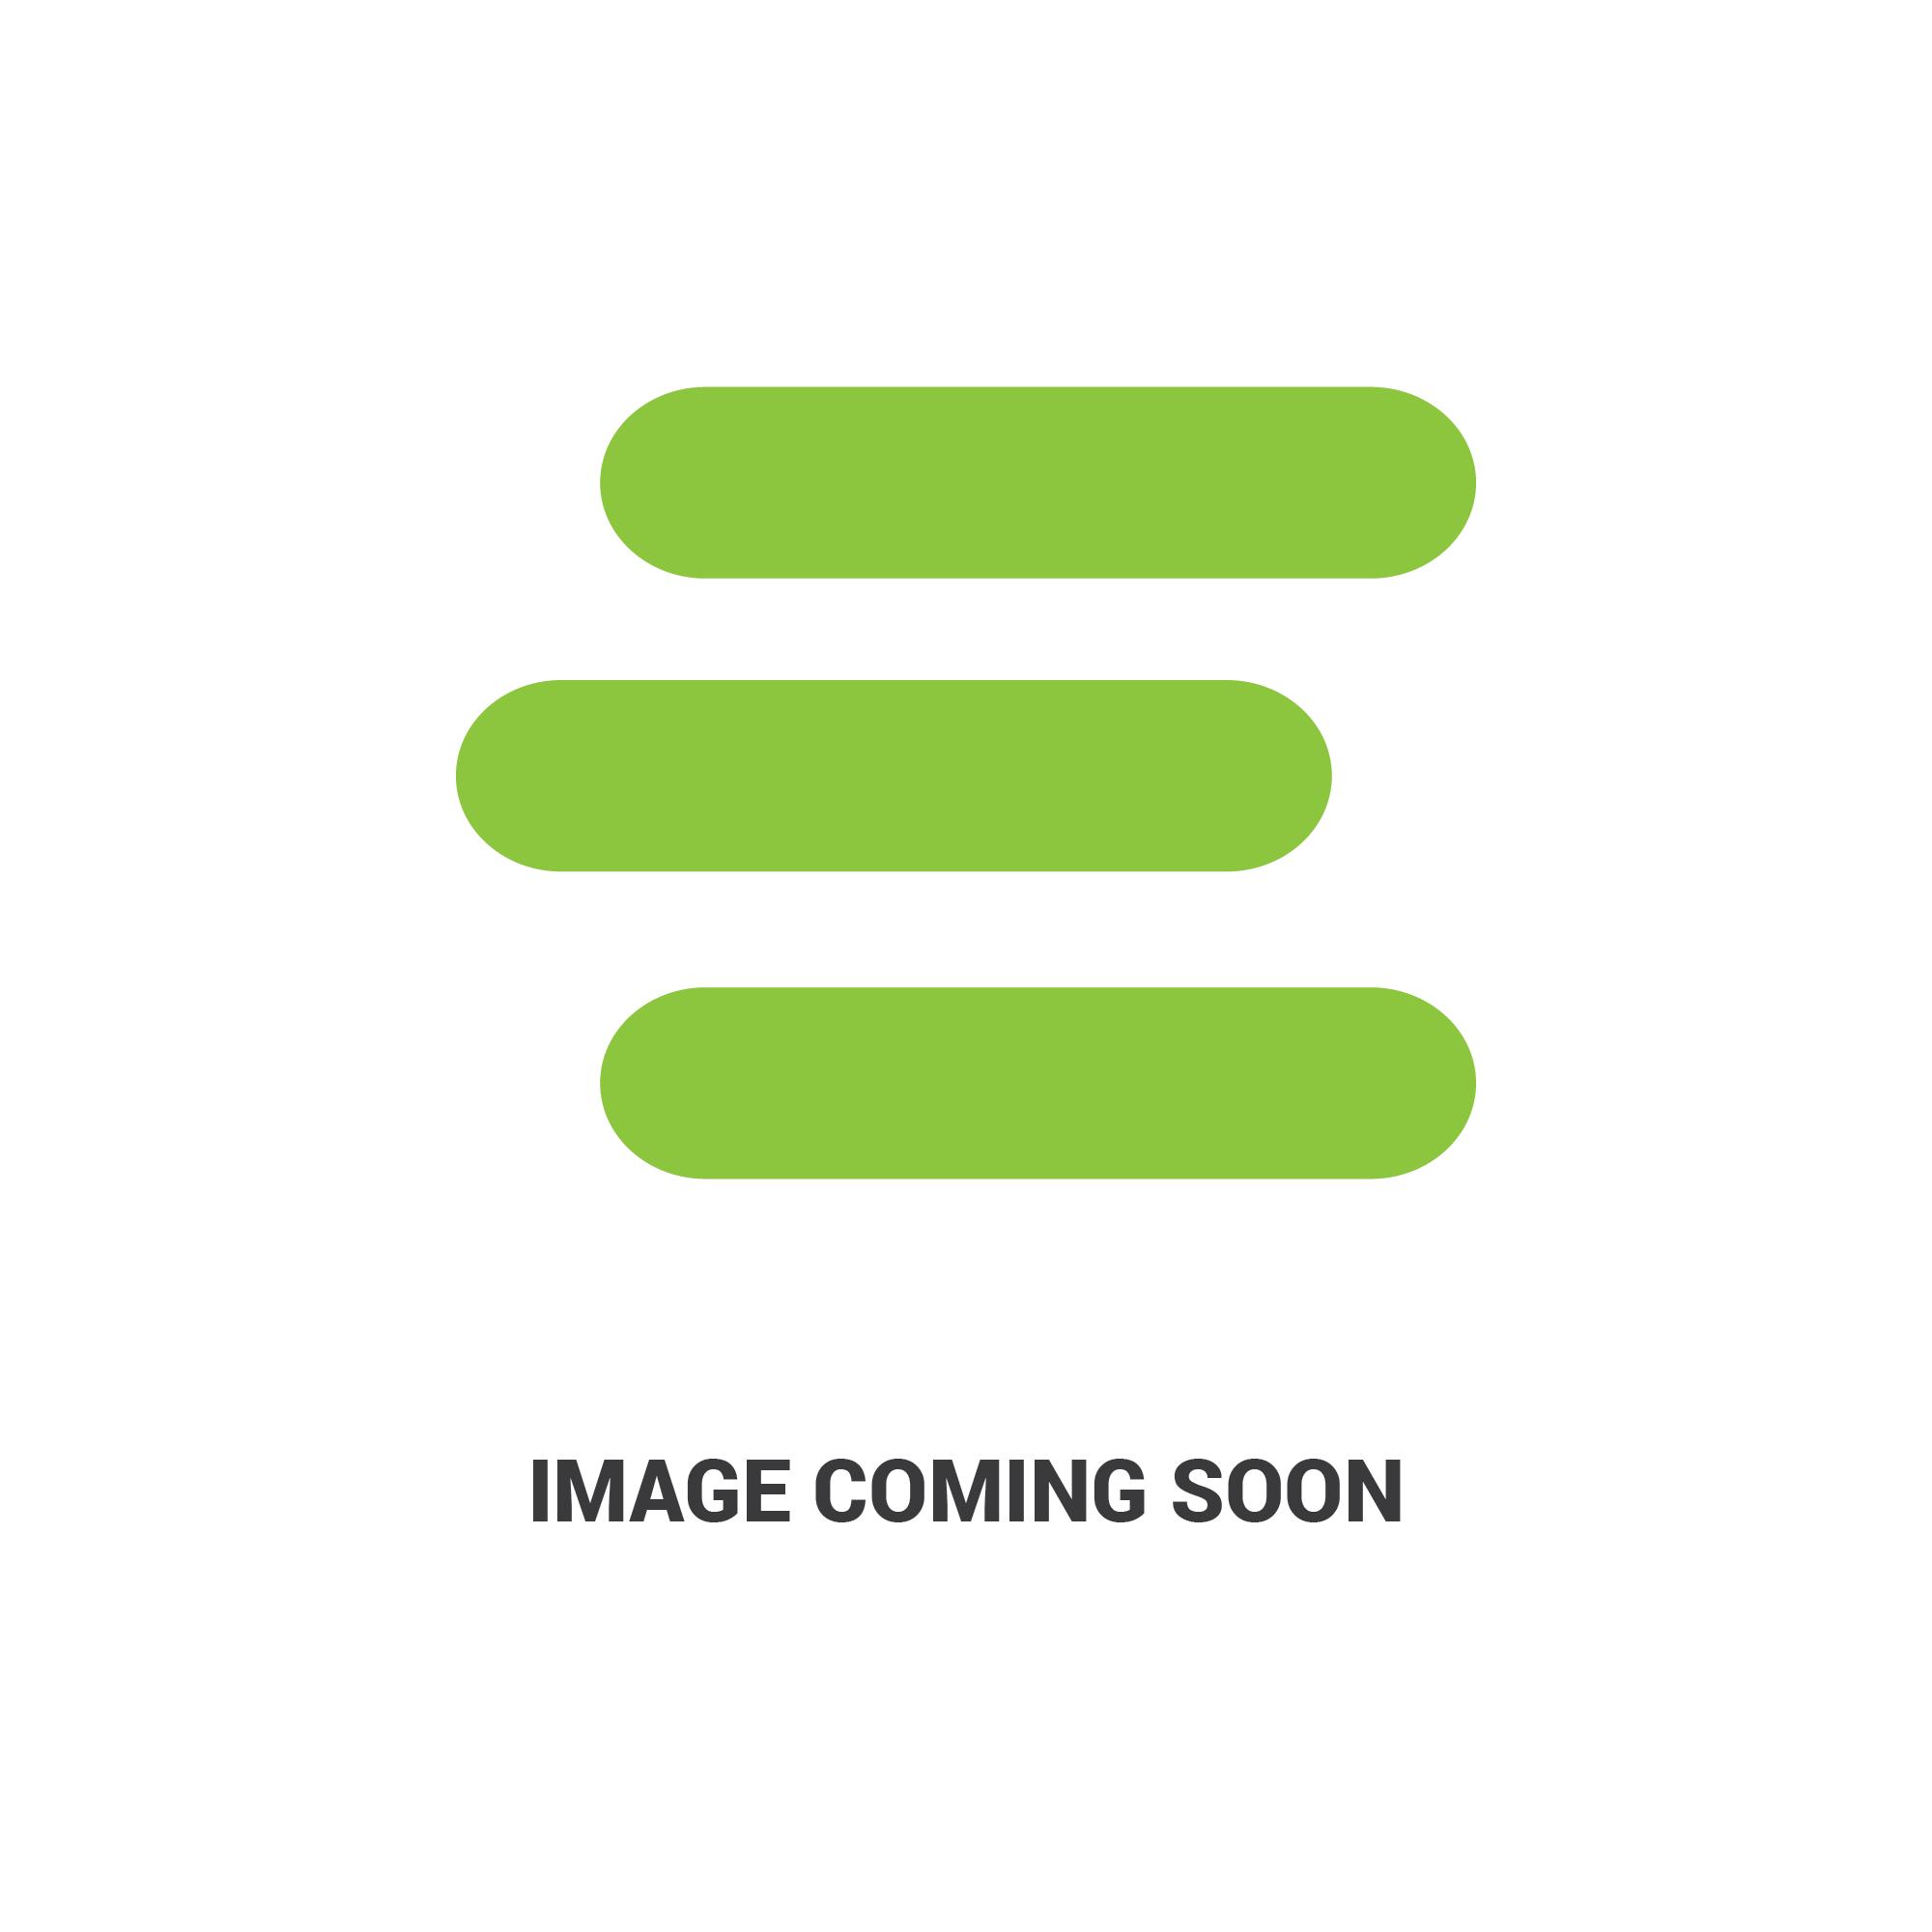 E-SJ237642289_1 .jpg